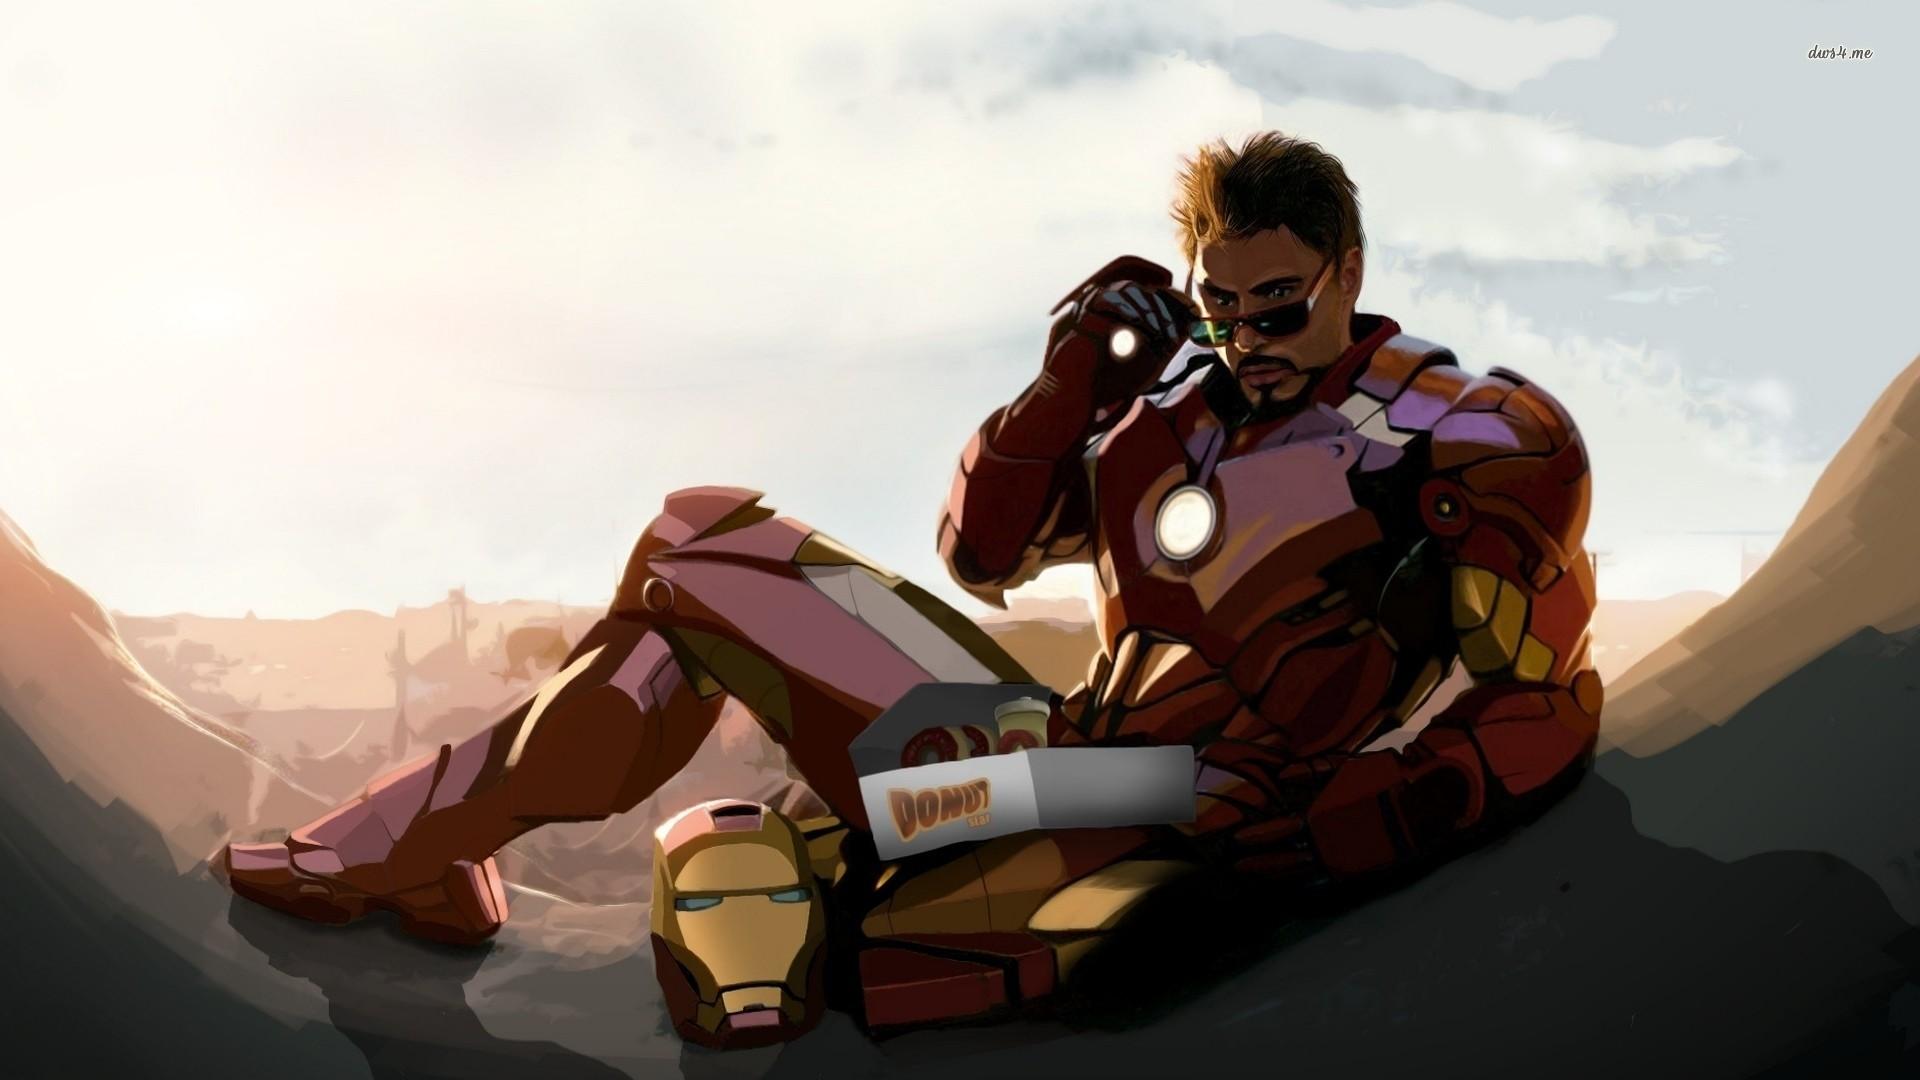 3840x2160 Iron Man 2016 Avengers Age Of Ultron 4K Wallpaper